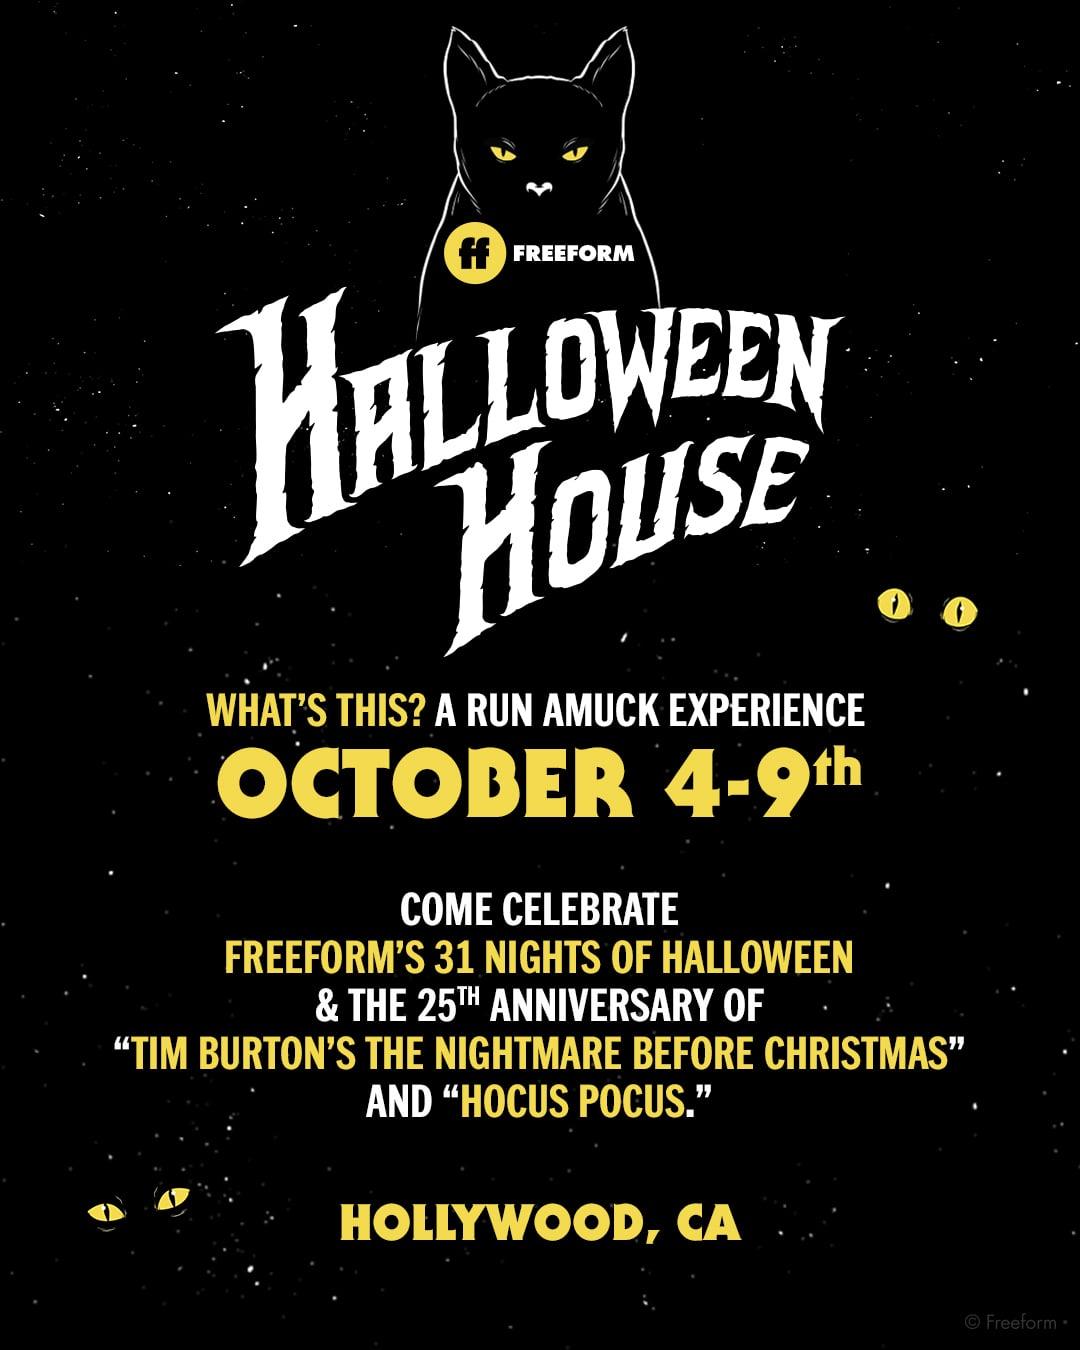 Freeform Halloween House 2018 | POPSUGAR Entertainment